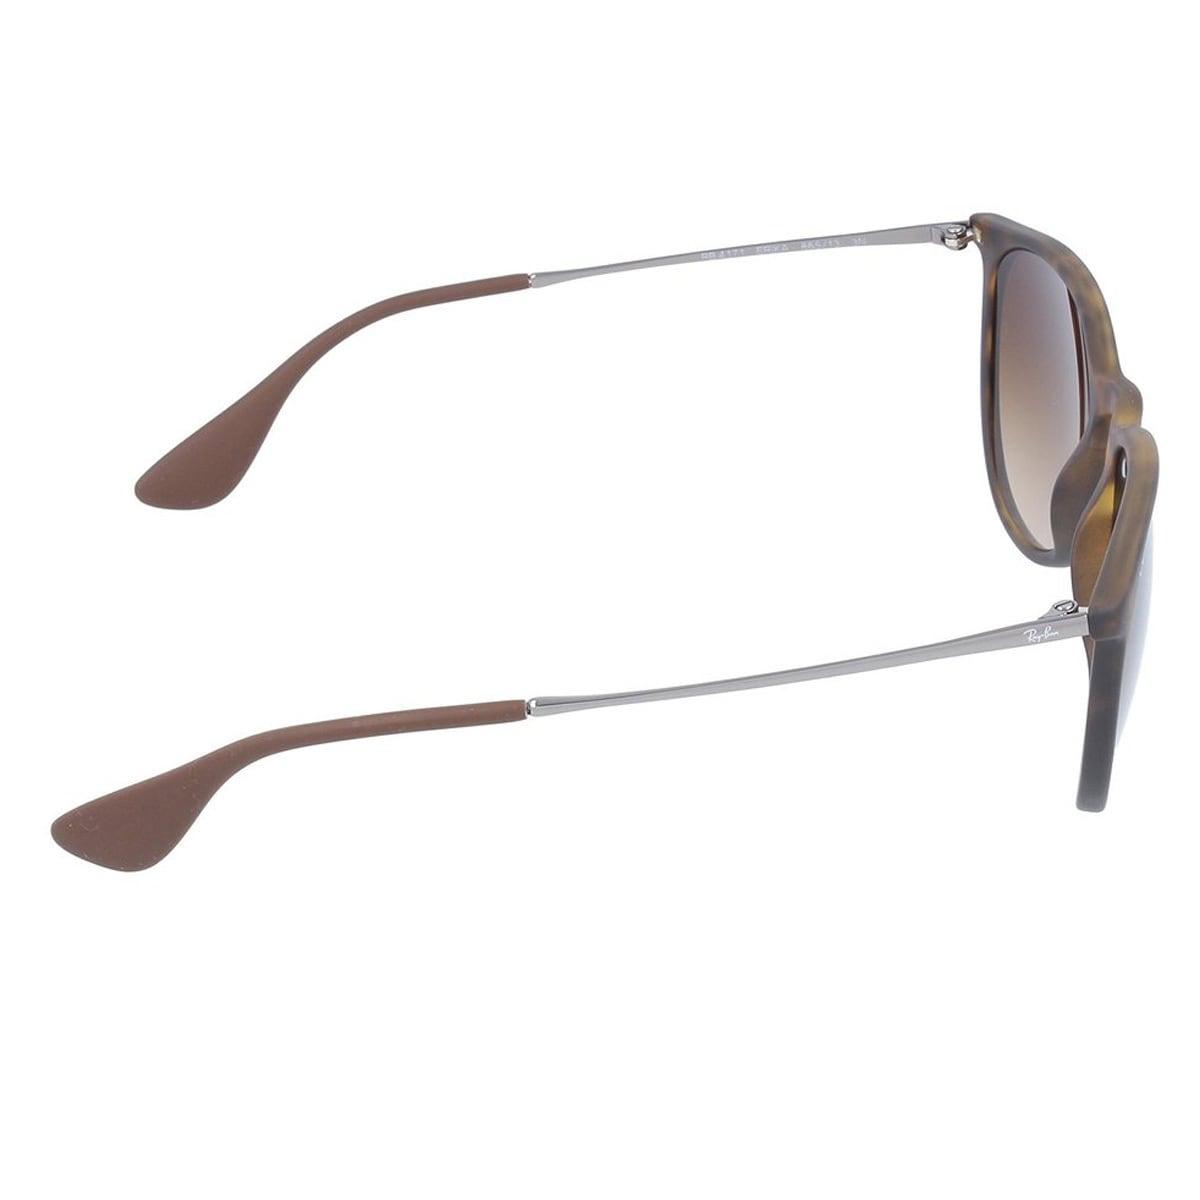 5dc069da728 Shop Ray-Ban Erika RB4171 865 13 Tortoise Gunmetal Frame Brown Gradient 54mm  Lens Sunglasses - Free Shipping Today - Overstock - 12382212